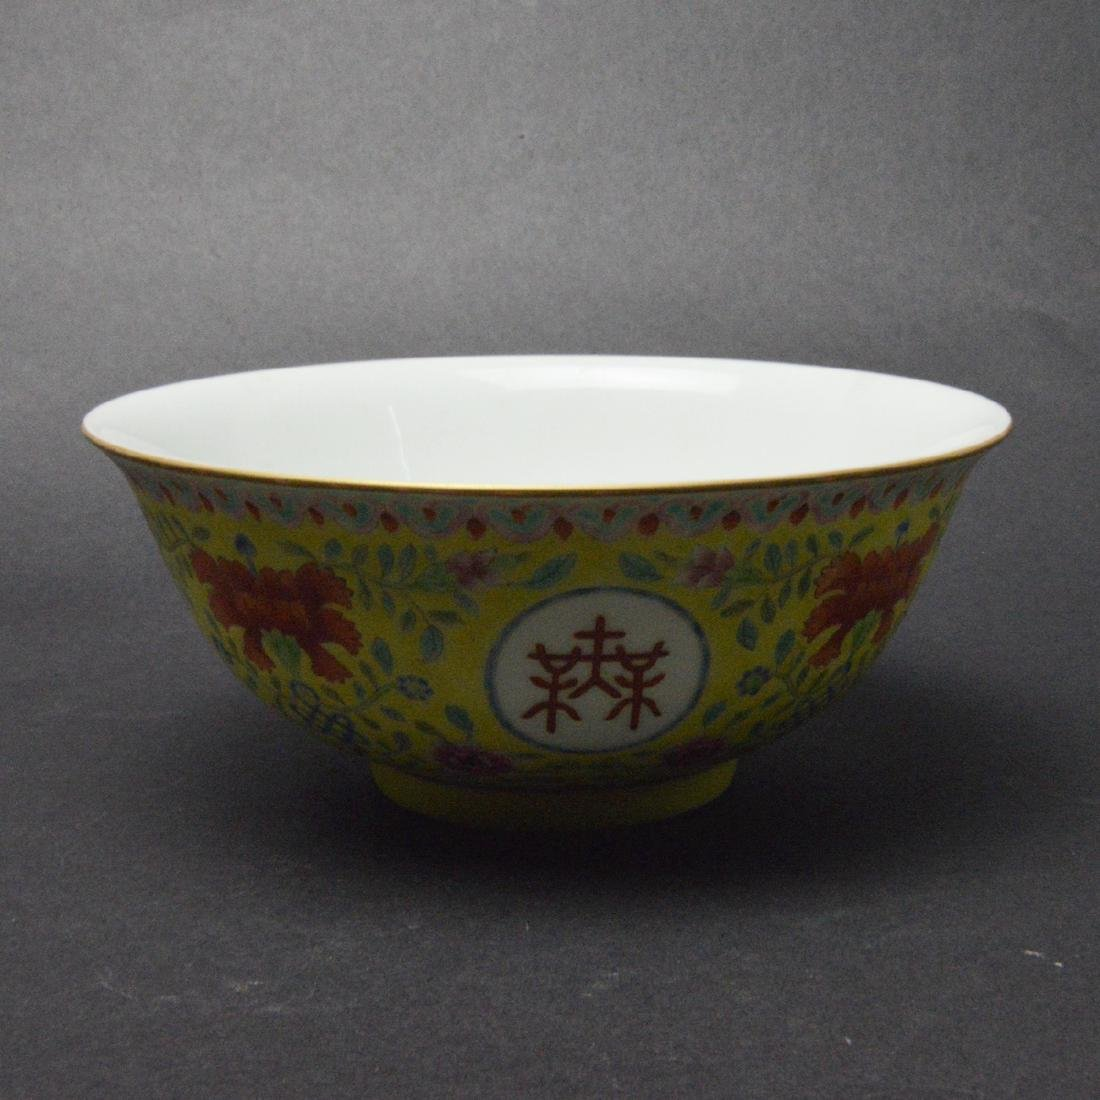 CHINESE FAMILLE ROSE PORCELAIN BOWL - 3